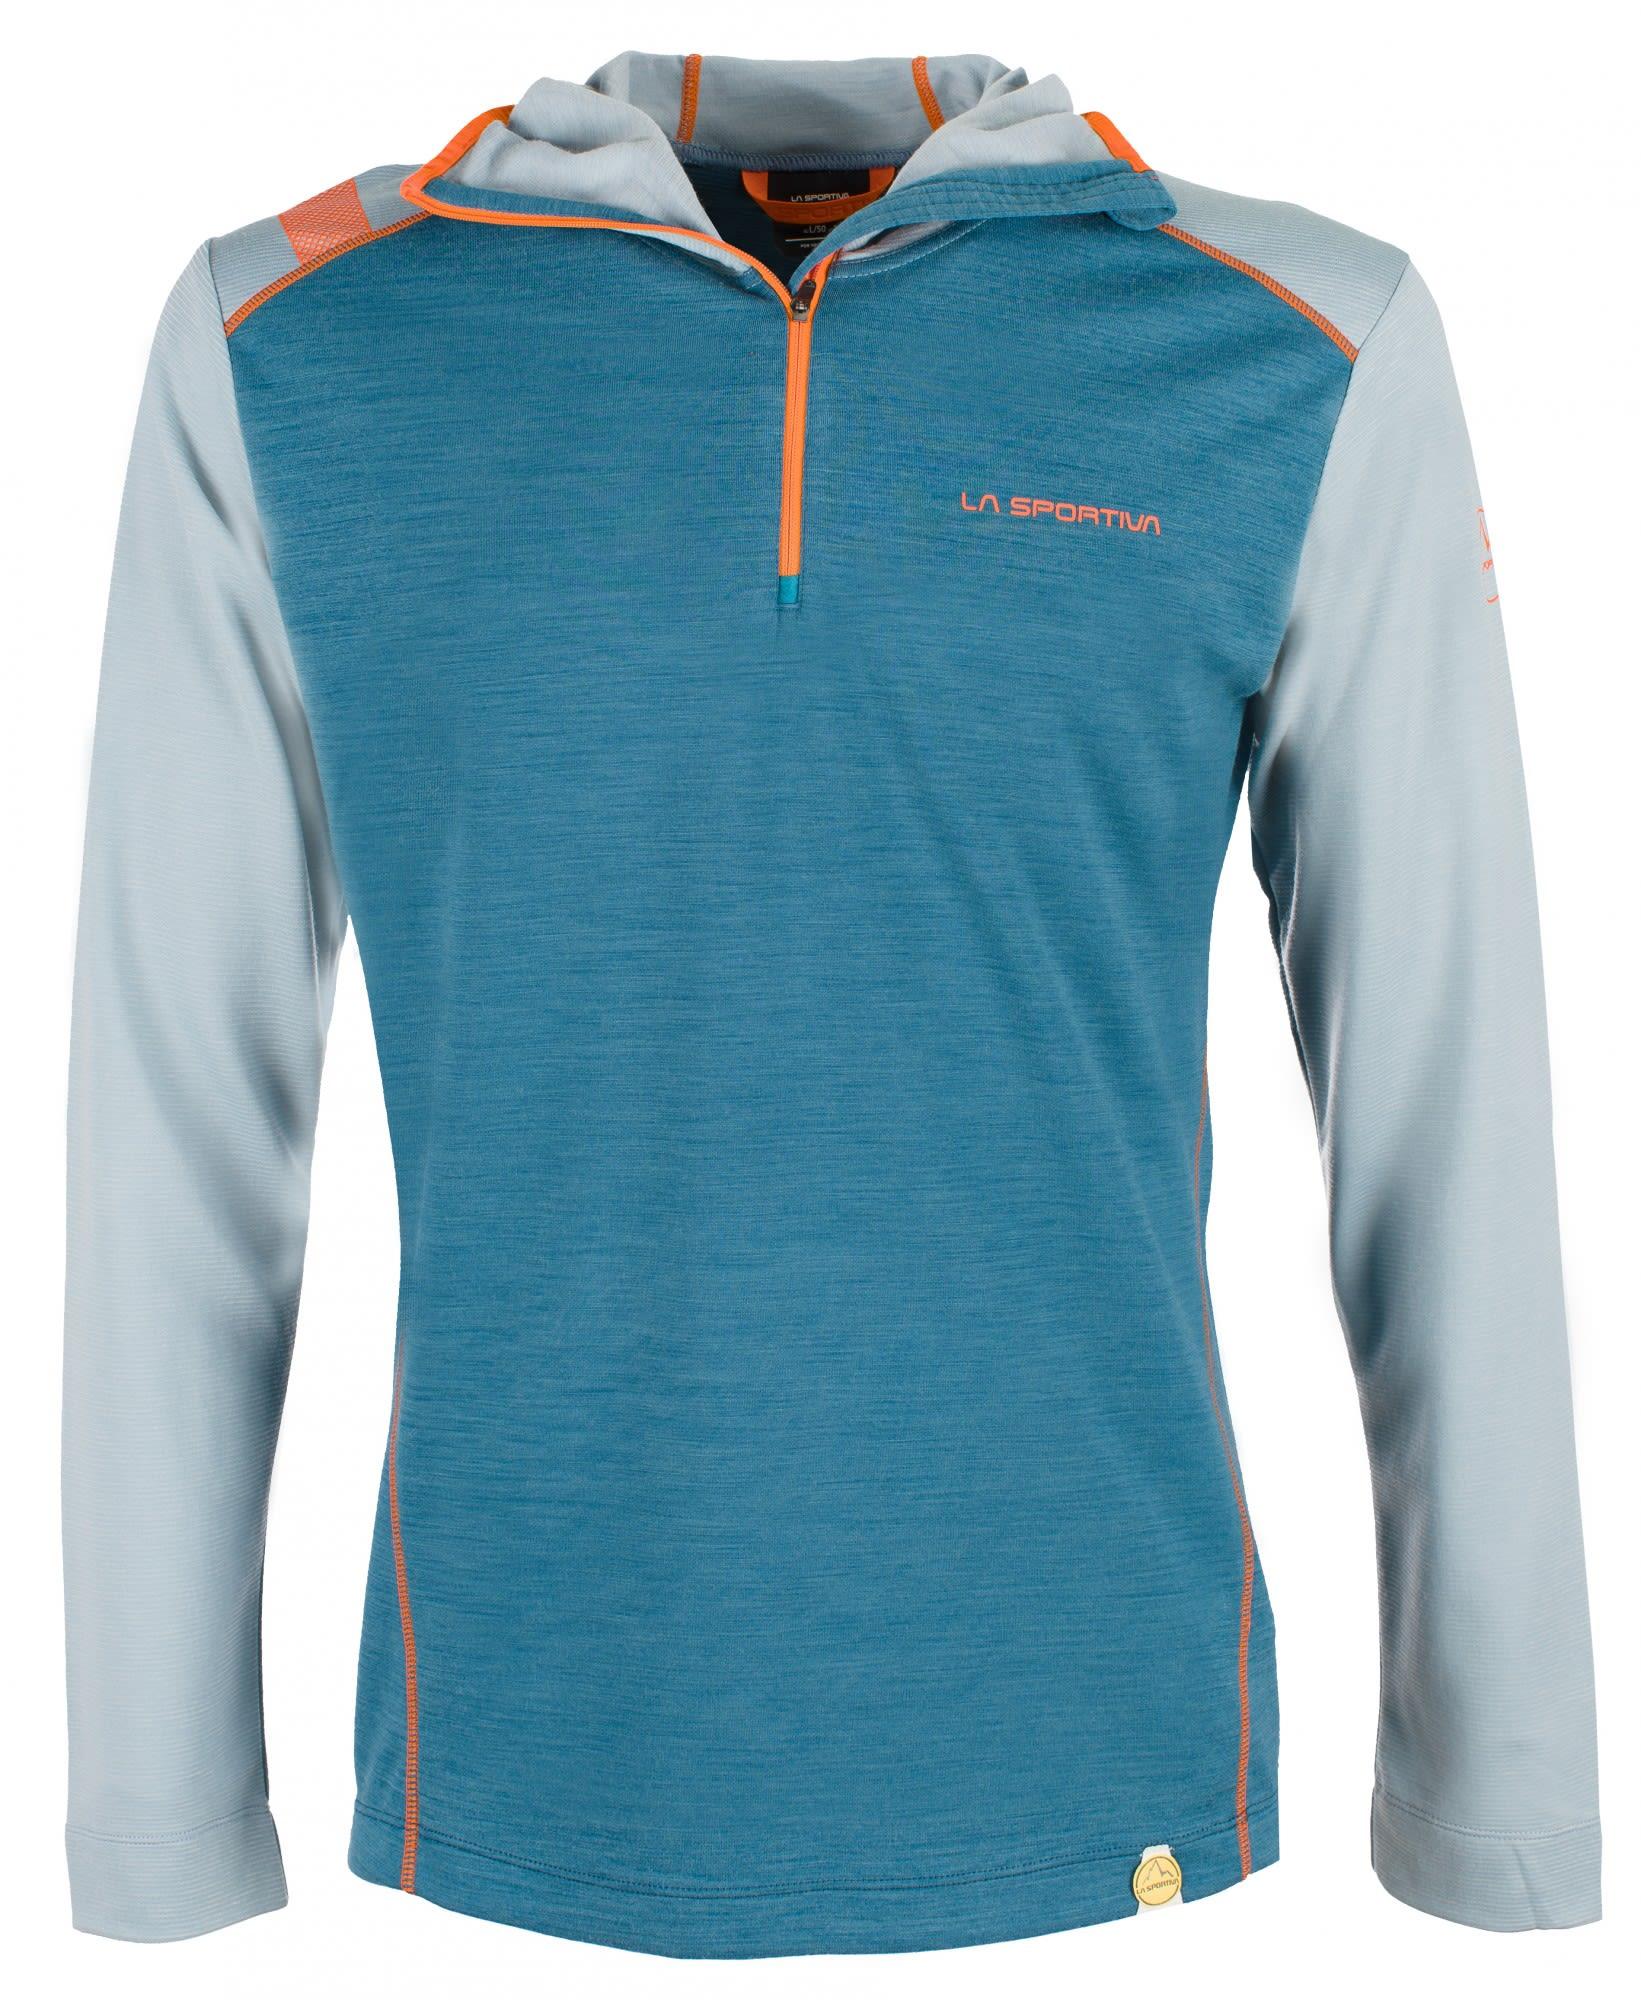 La Sportiva Stratosphere Hoody Blau, Male Merino Langarm-Shirt, S